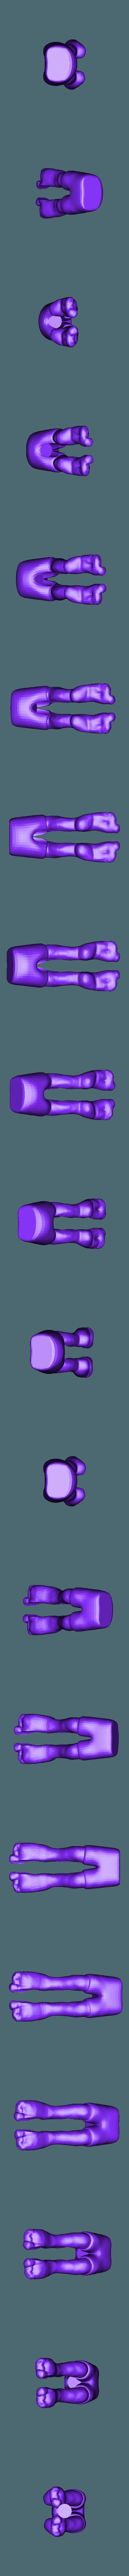 jambes romain.stl Descargar archivo STL FANART - Obélix abofetea a un legionario romano - Diorama • Objeto para impresora 3D, foxgraph